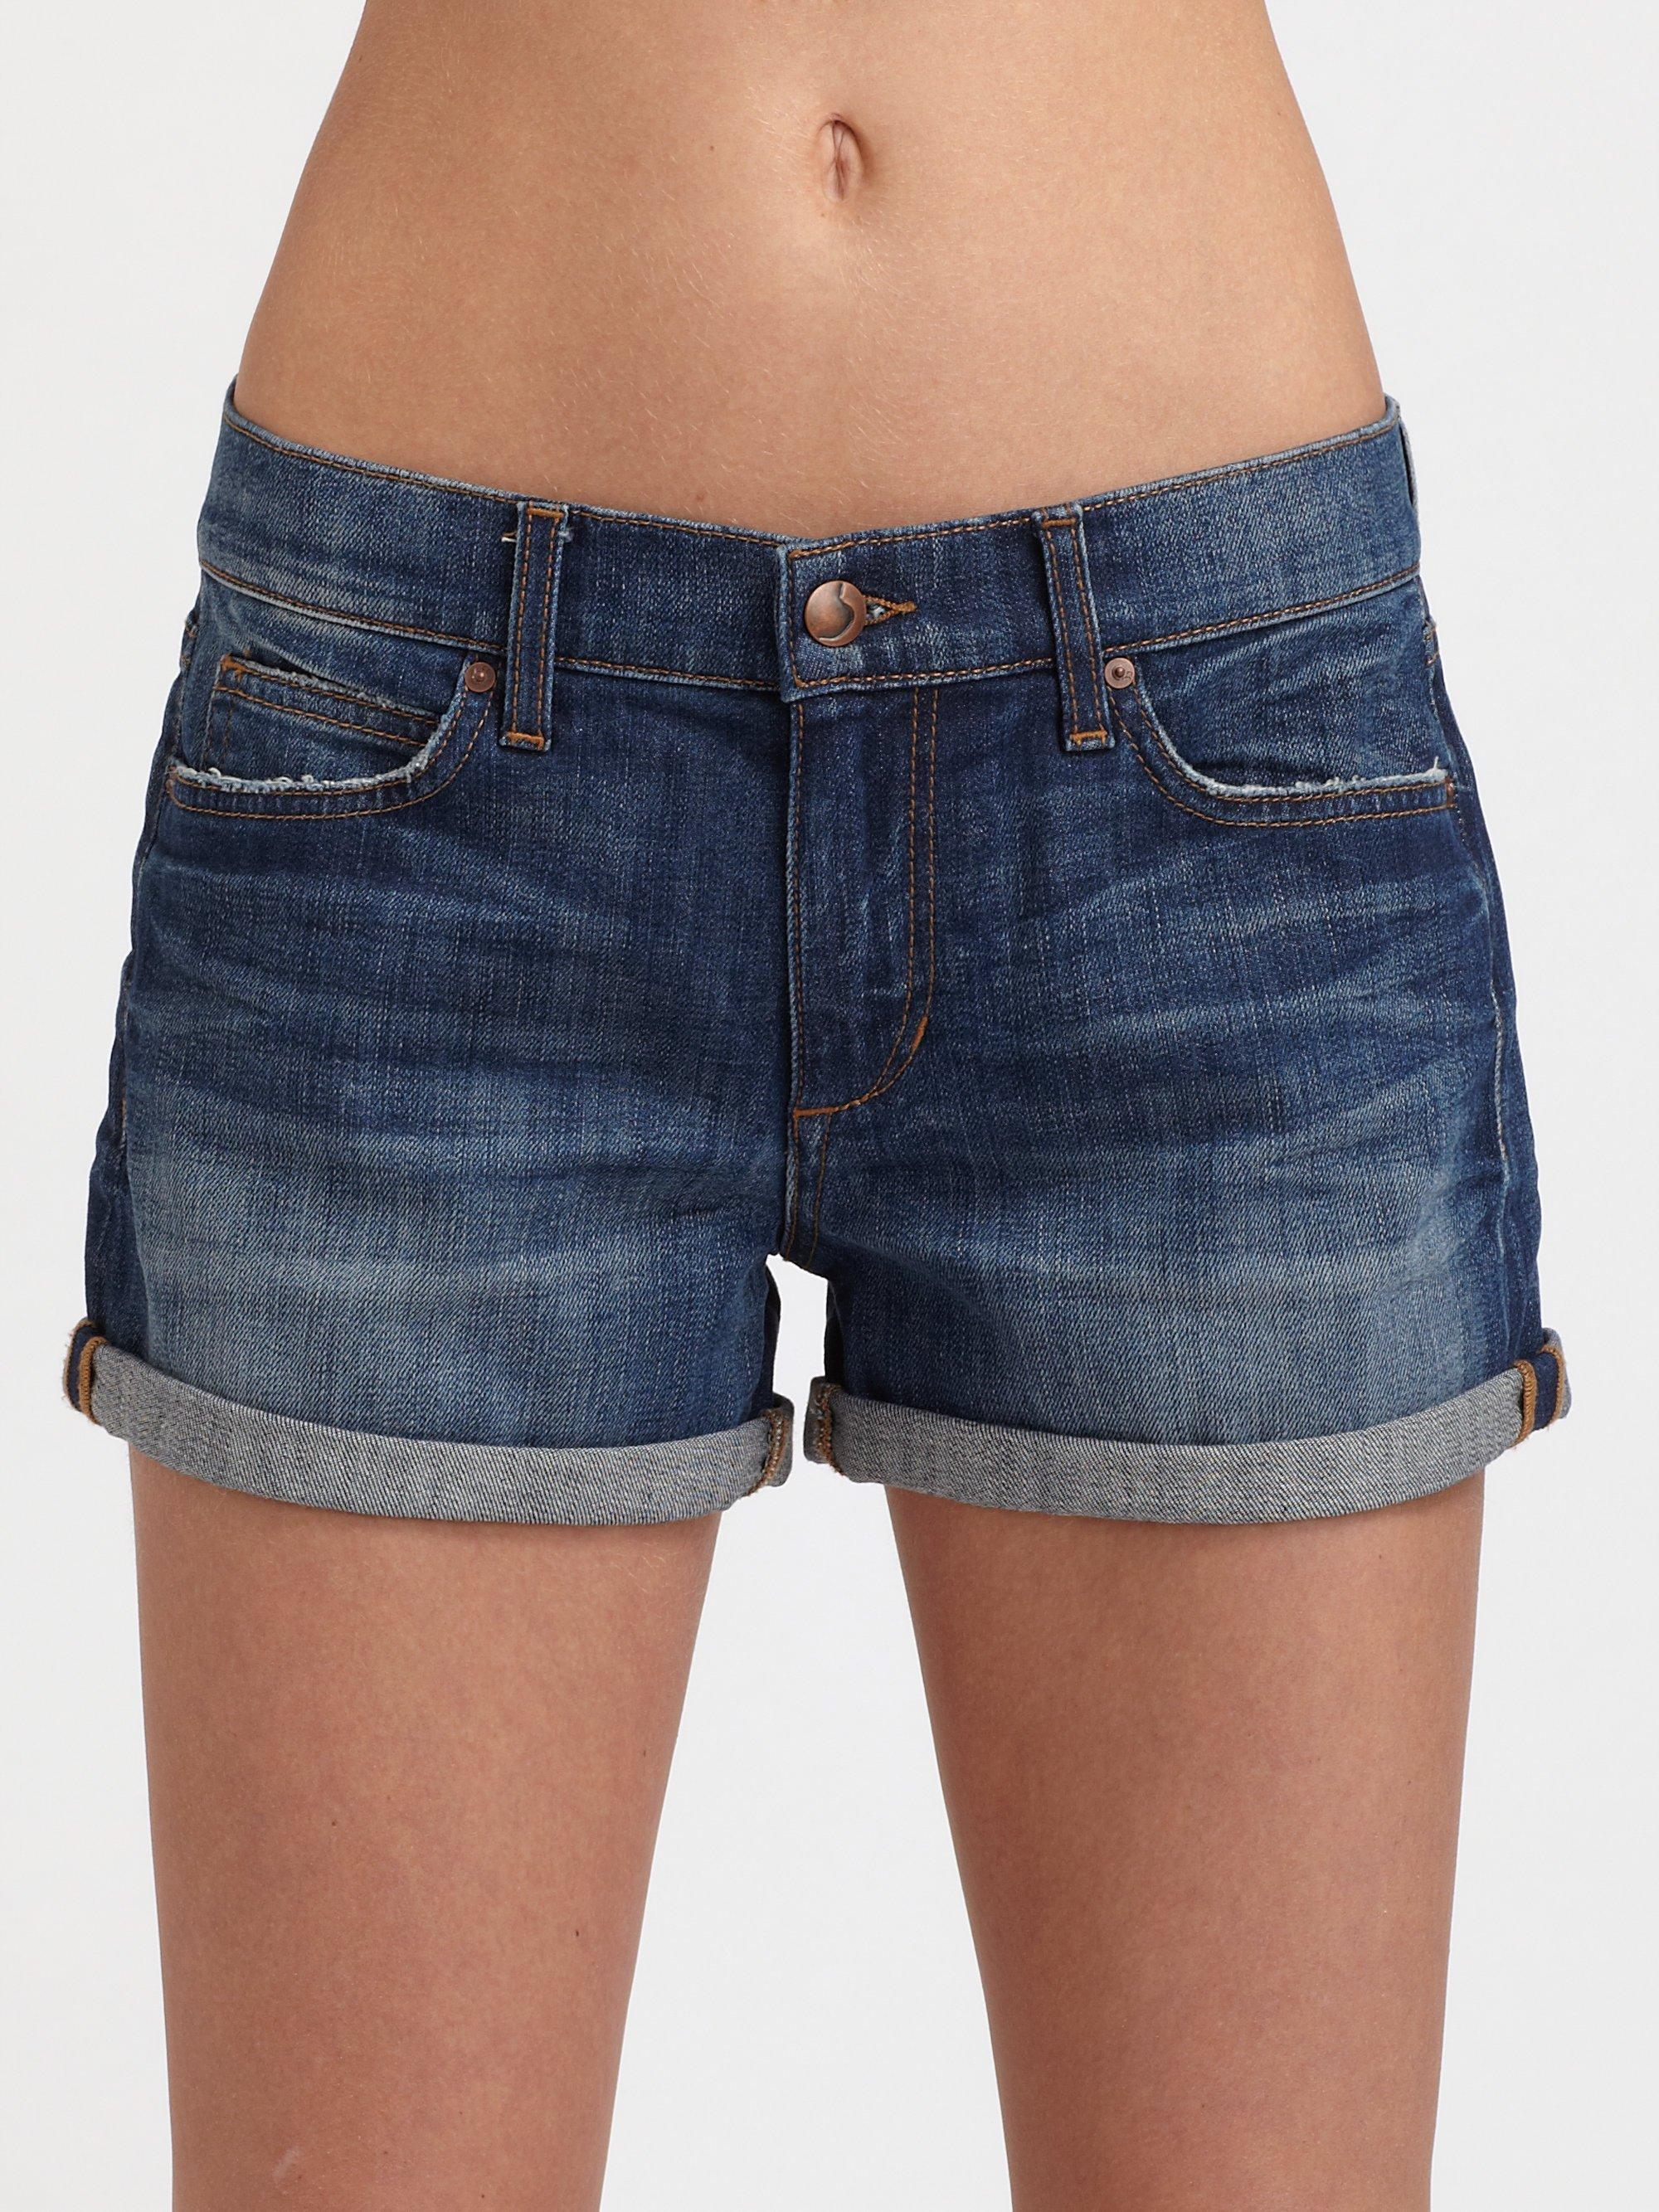 5eab3a9e46 Joe's Jeans Cuffed Midrise Denim Shorts in Blue - Lyst